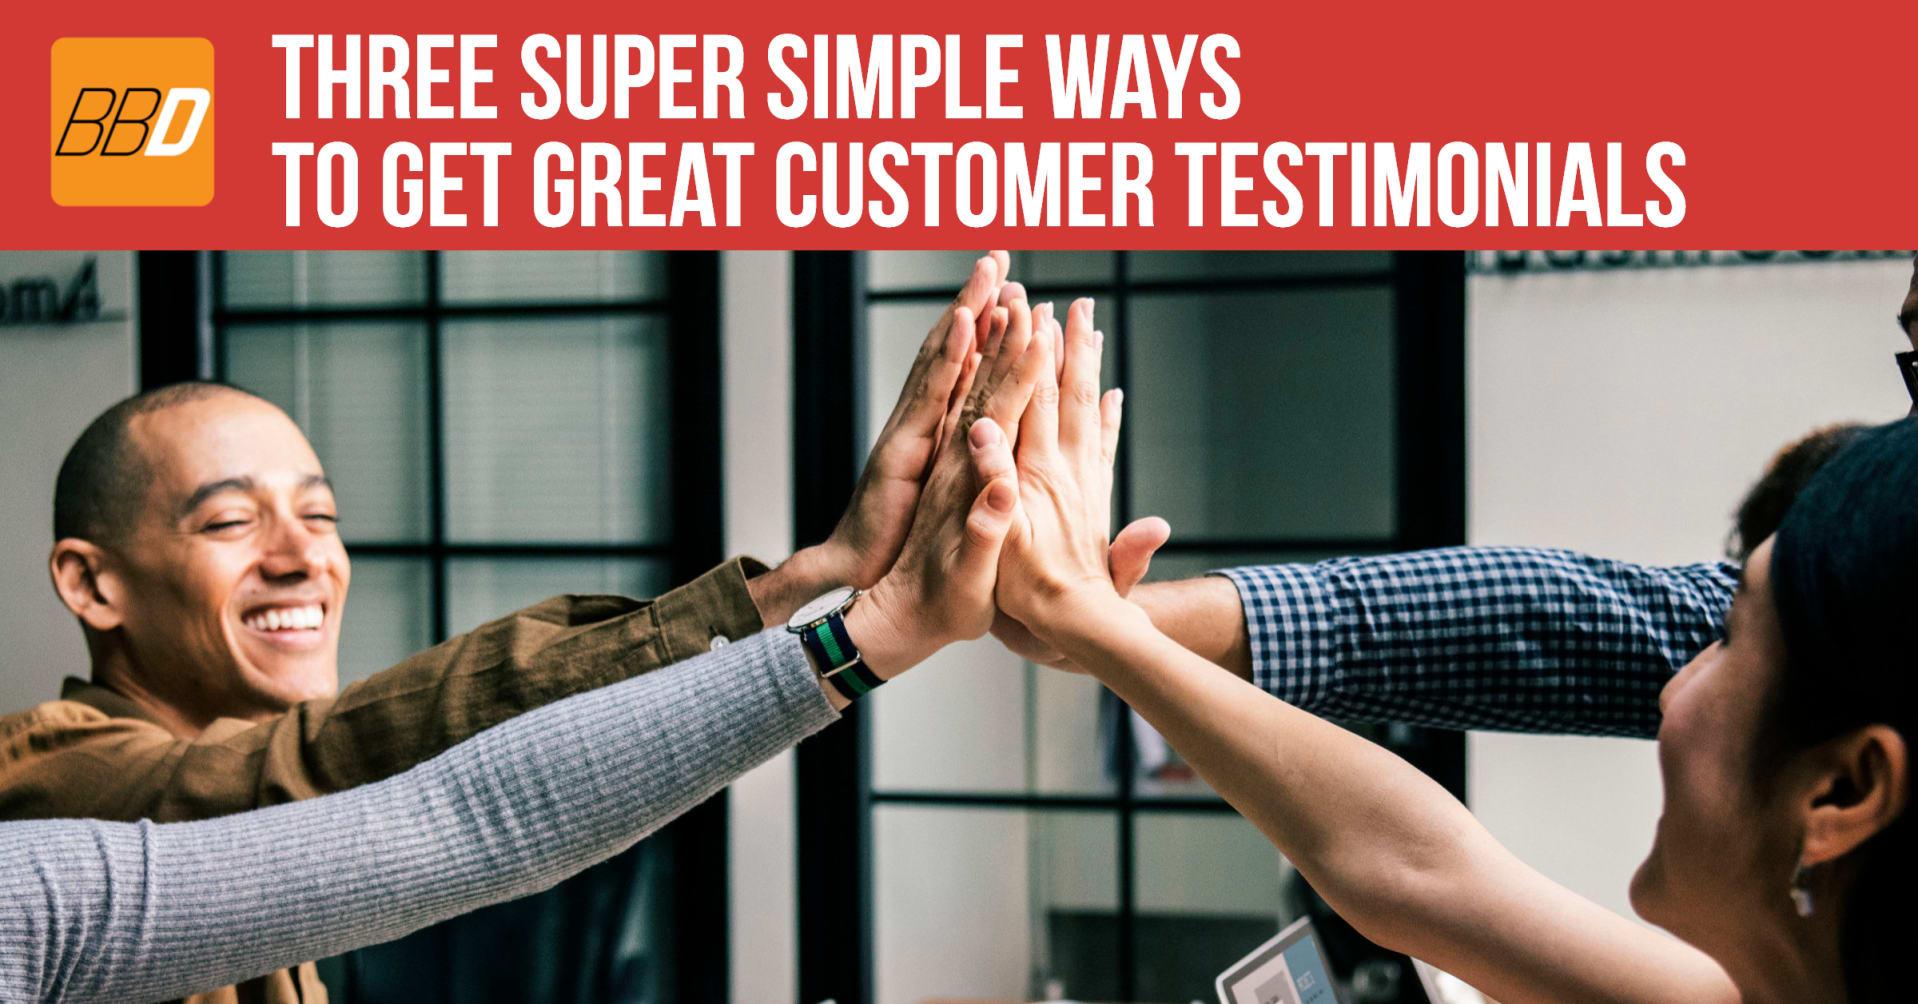 Three Super Simple ways to get Great Customer Testimonials